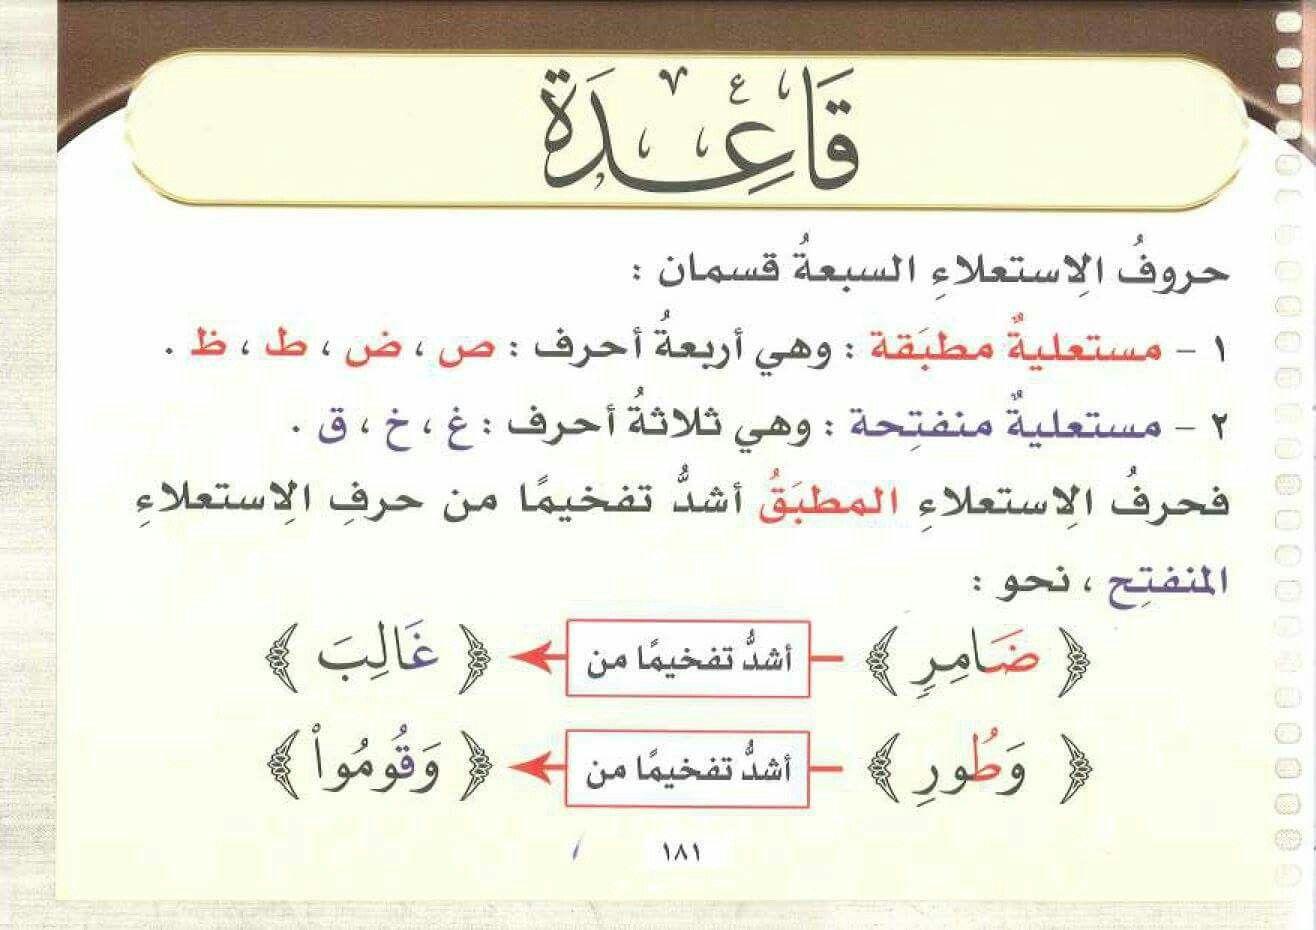 Pin By Moimeme Moimeme On التجويد المصور1أيمن سويد Quran Bullet Journal Journal